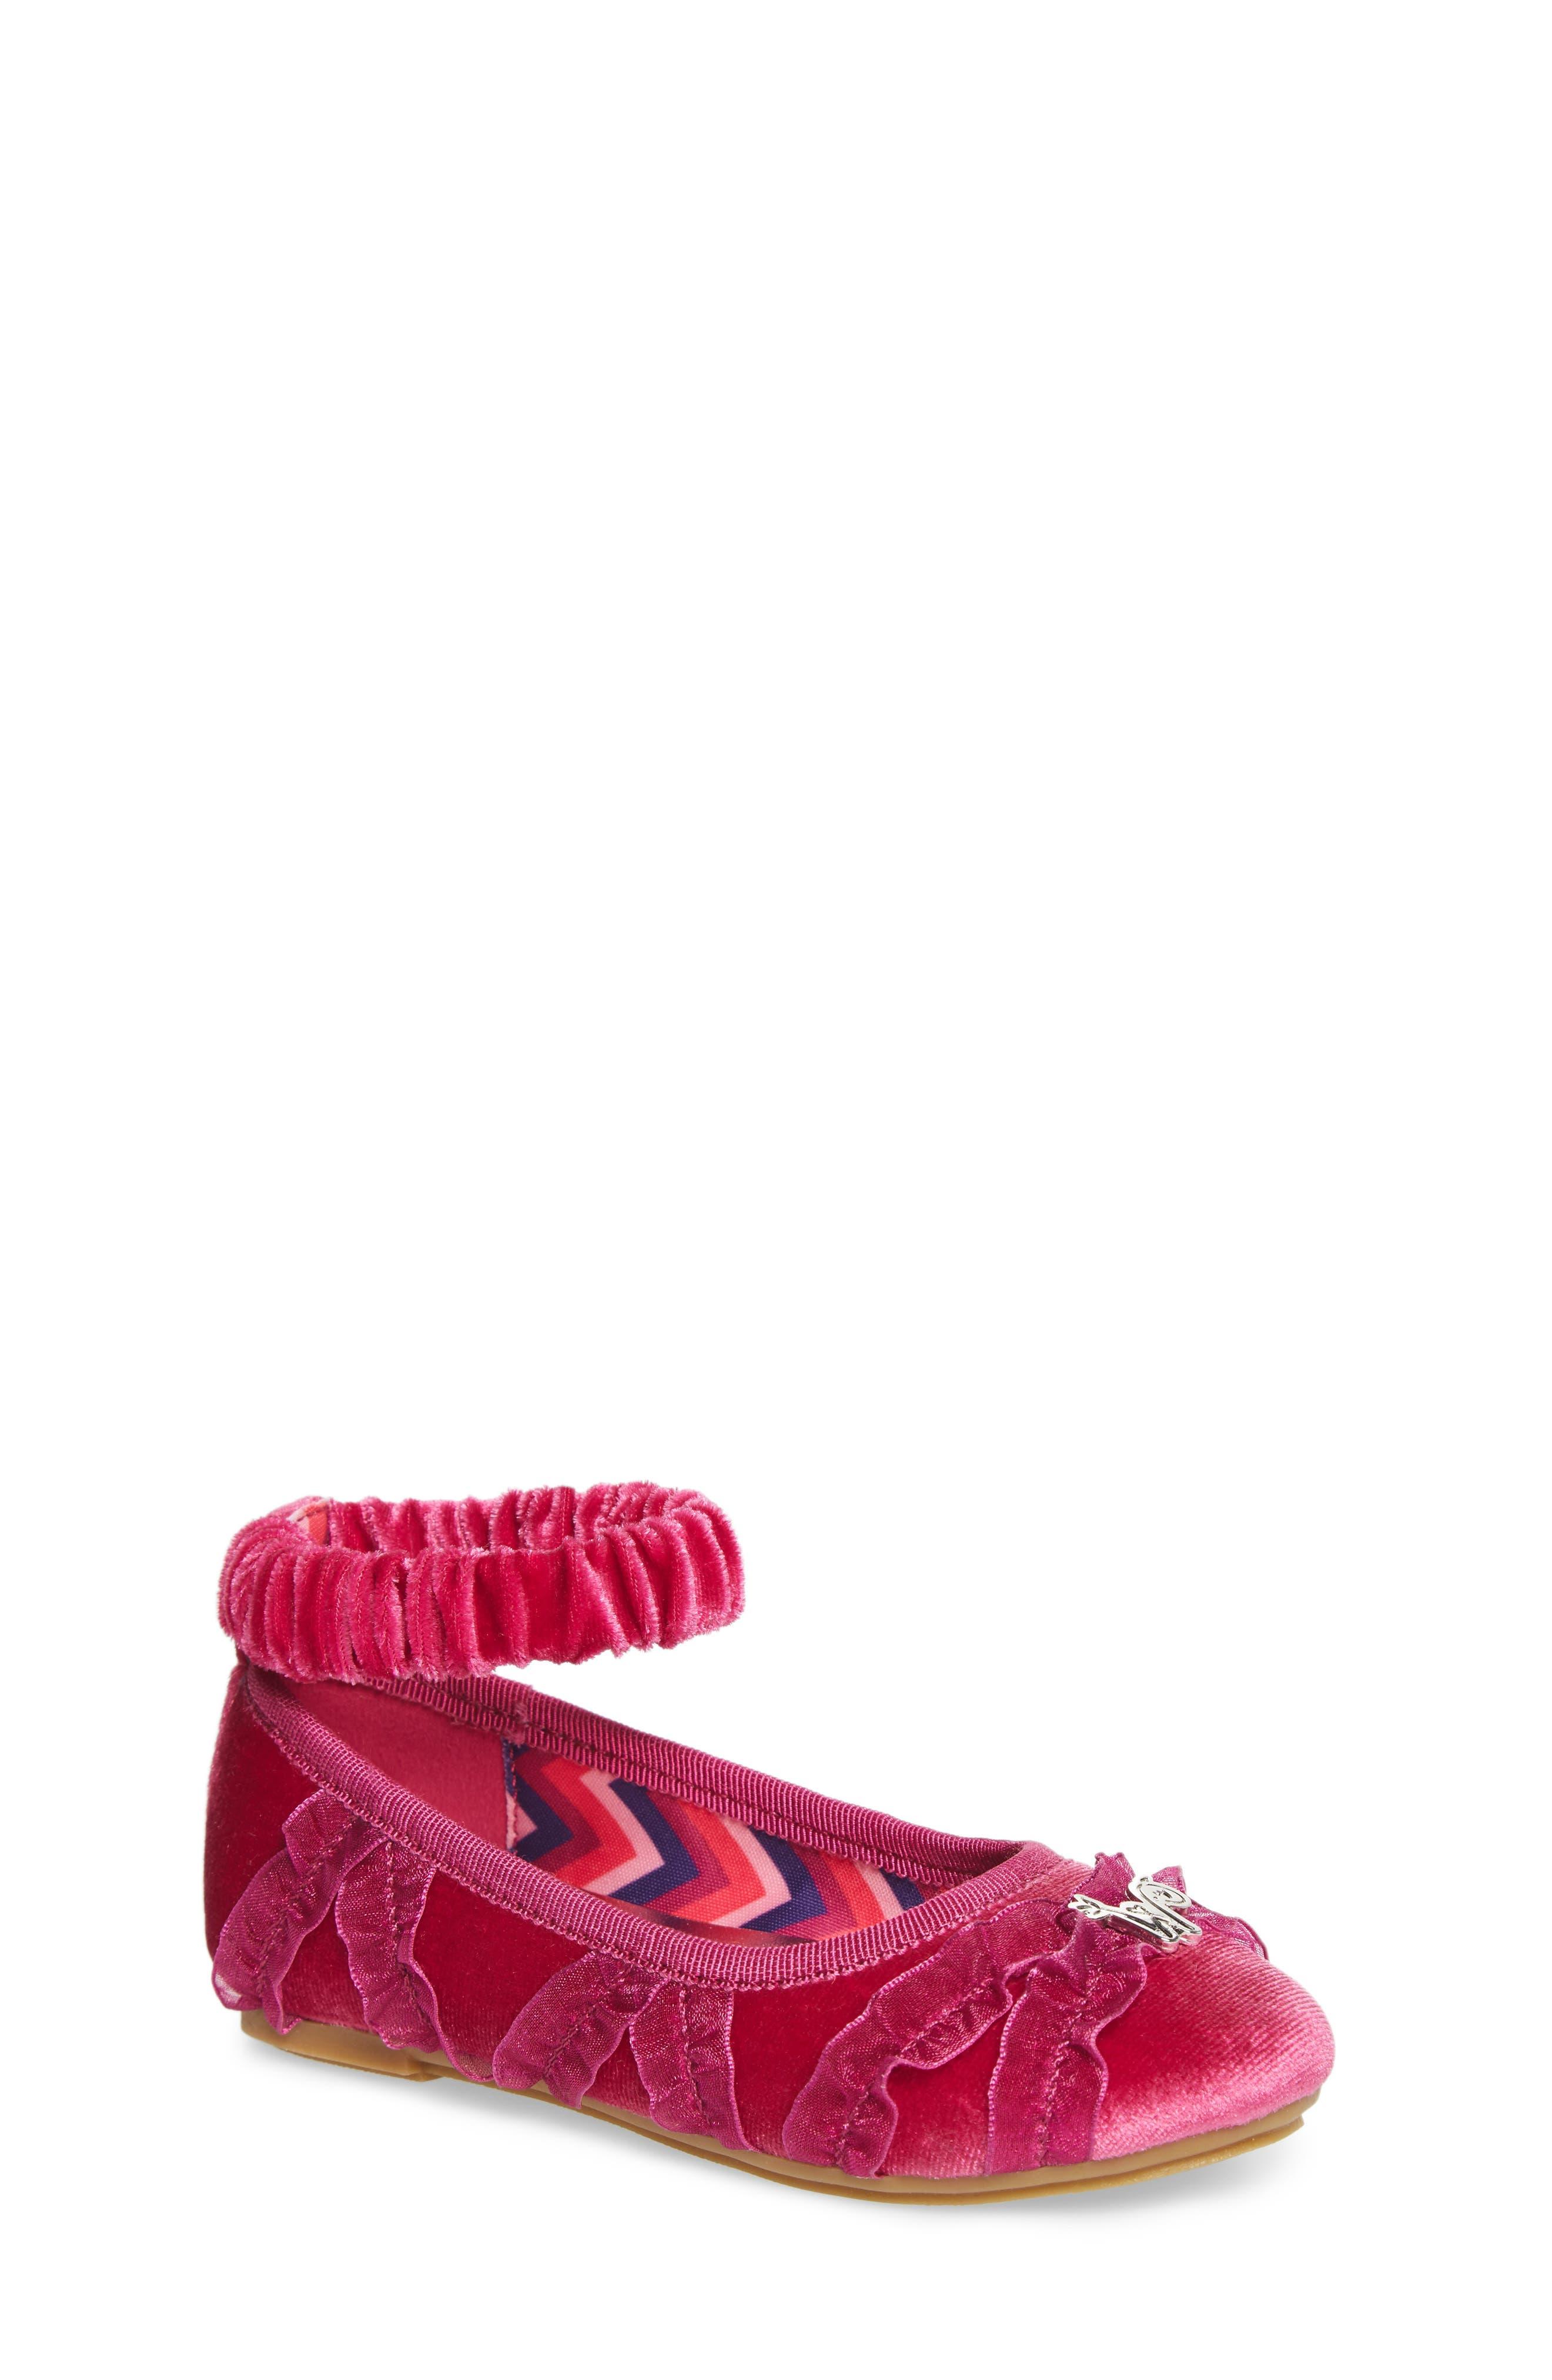 WellieWishers by American Girl Emerson Ankle Strap Ballet Flat (Walker, Toddler, Little Kid & Big Kid)